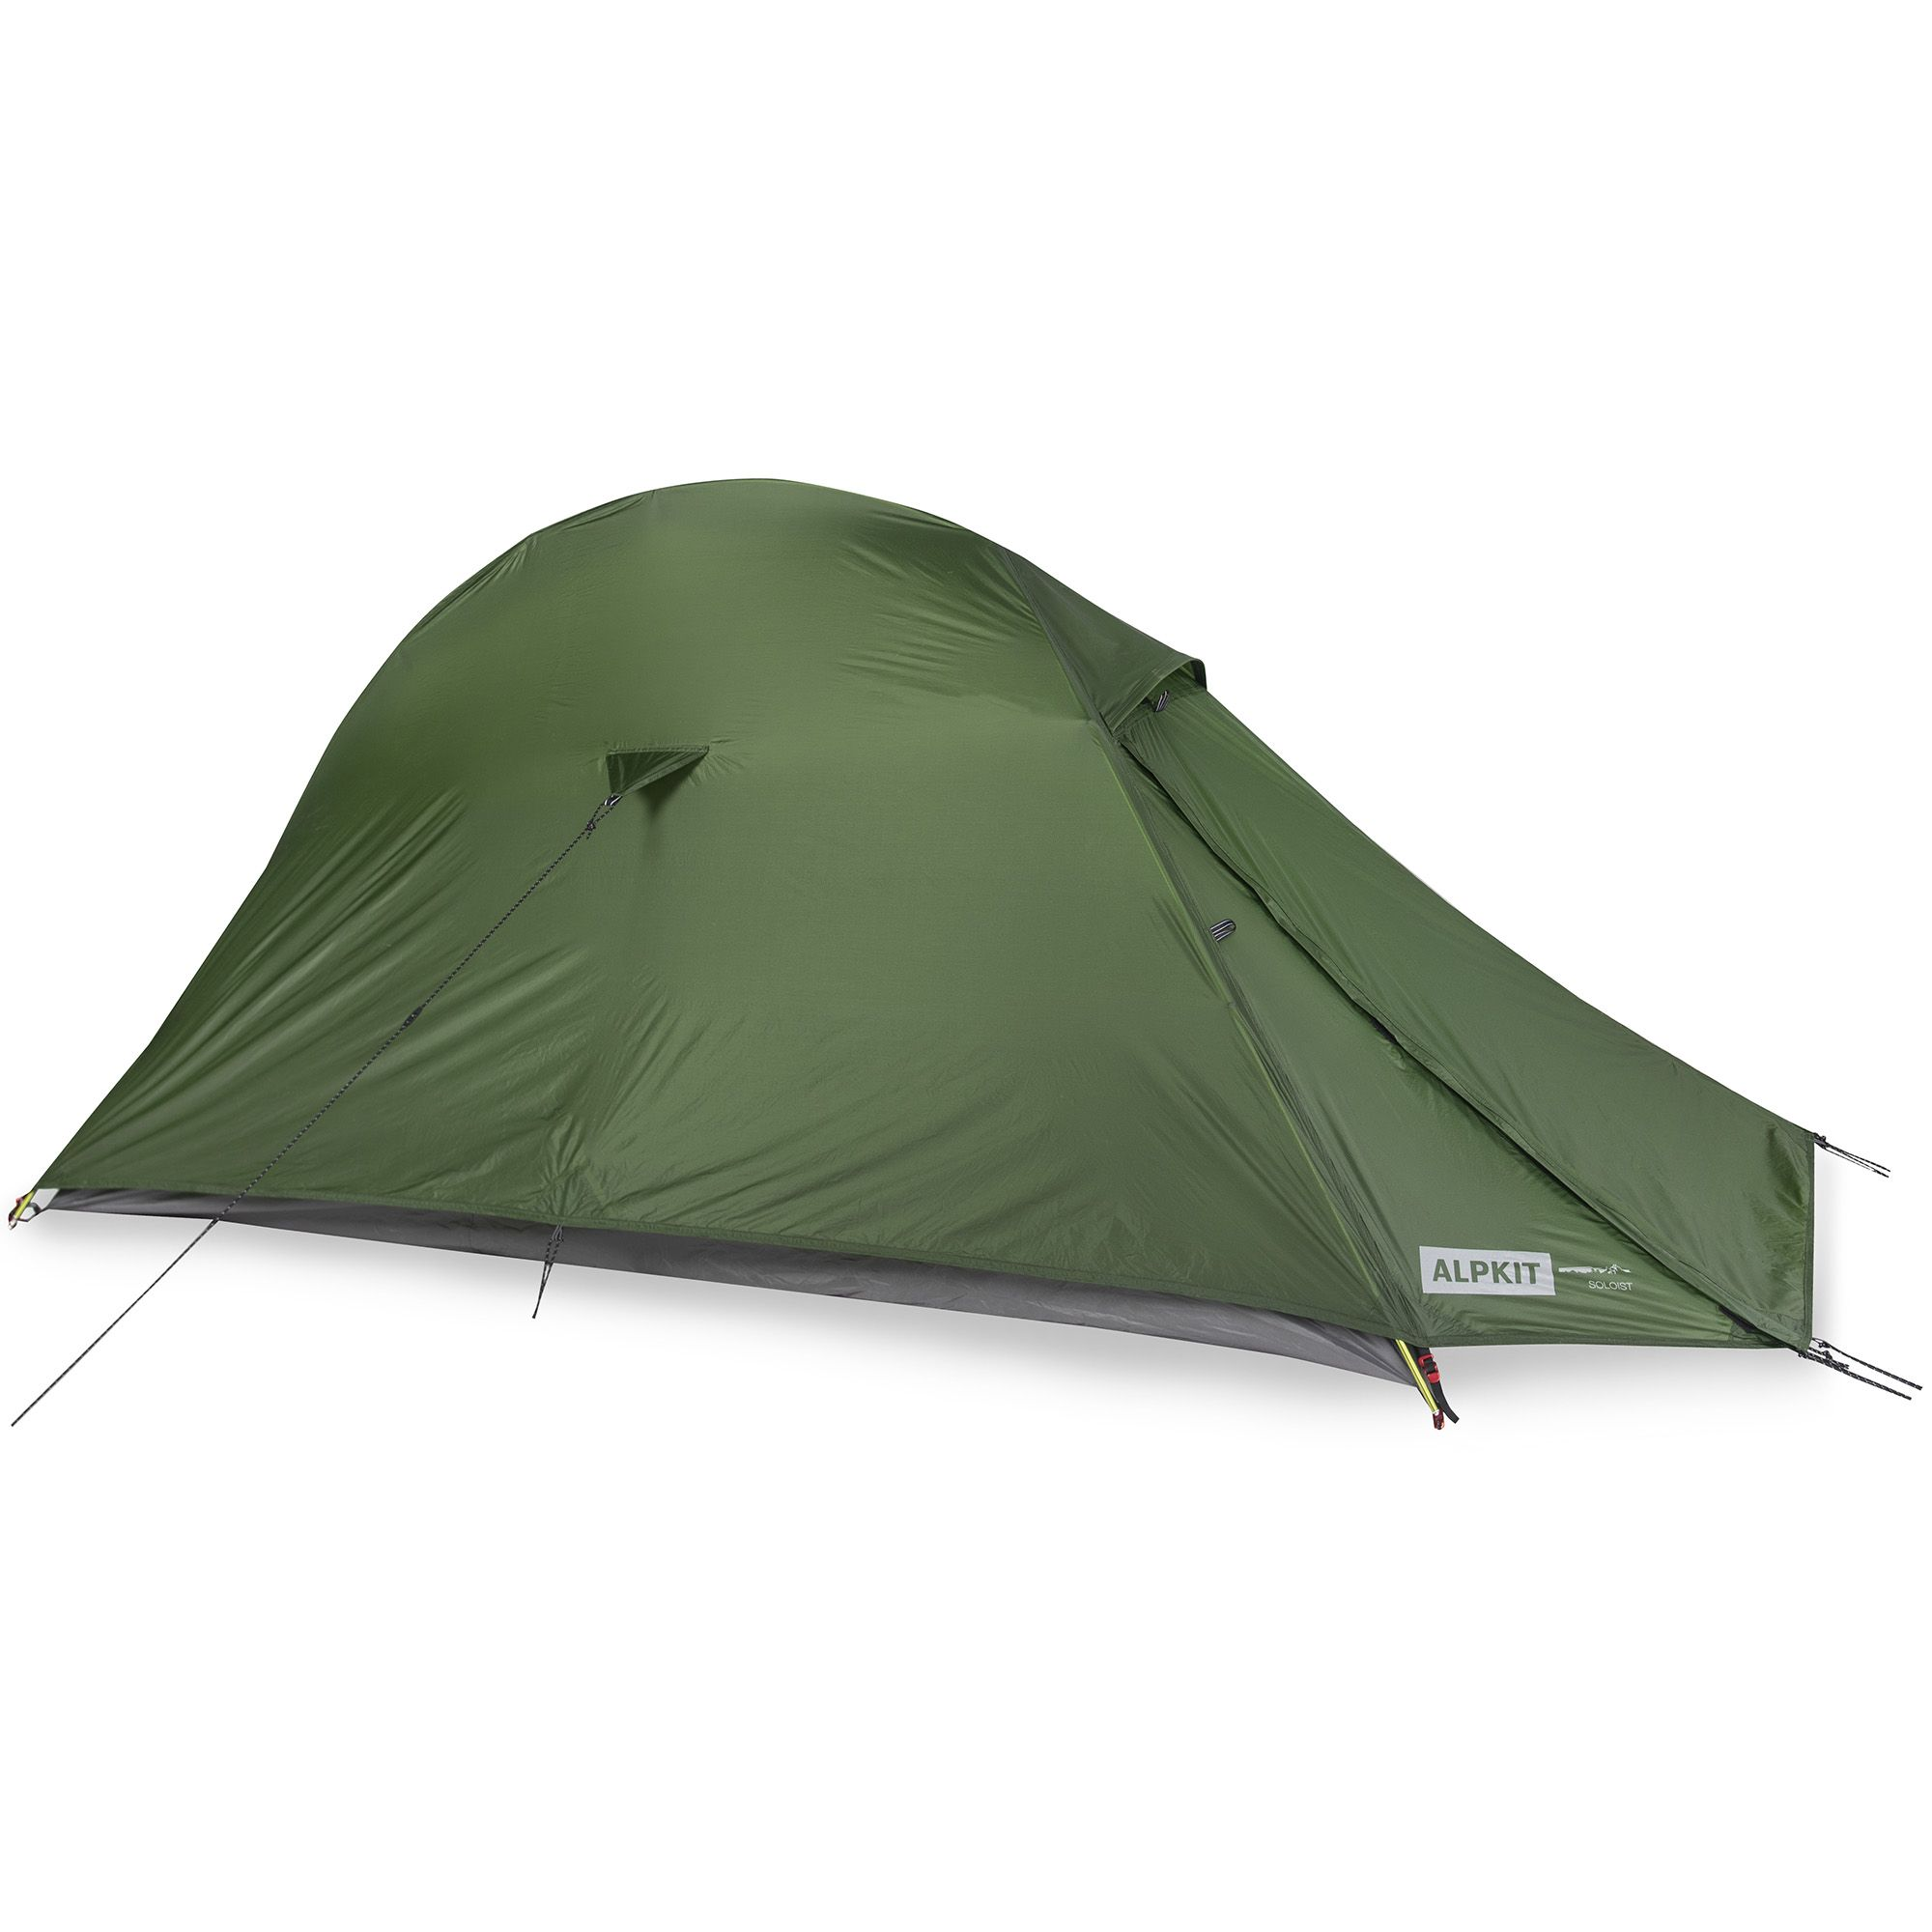 2 Person Tent Vango Voyager 200 Tent